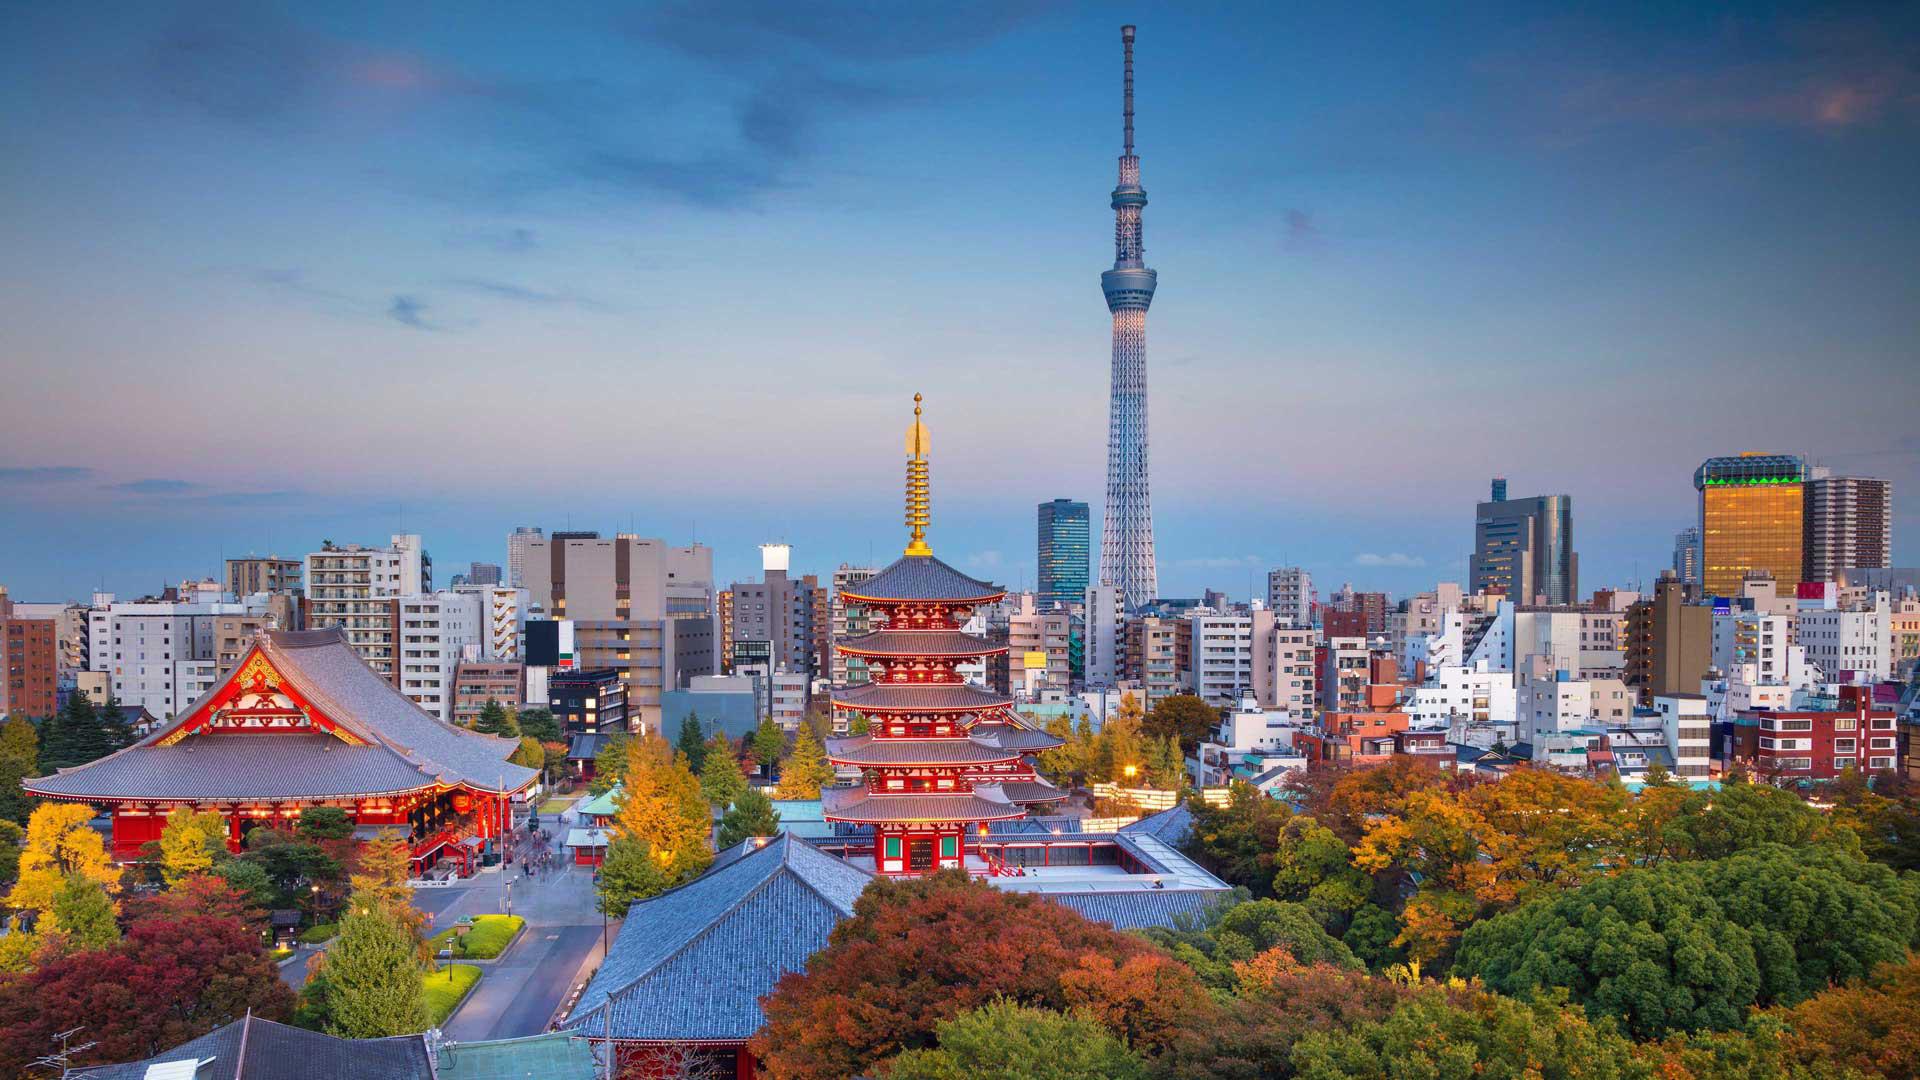 Alternatif Alışverişte: Tokyo, Koenji